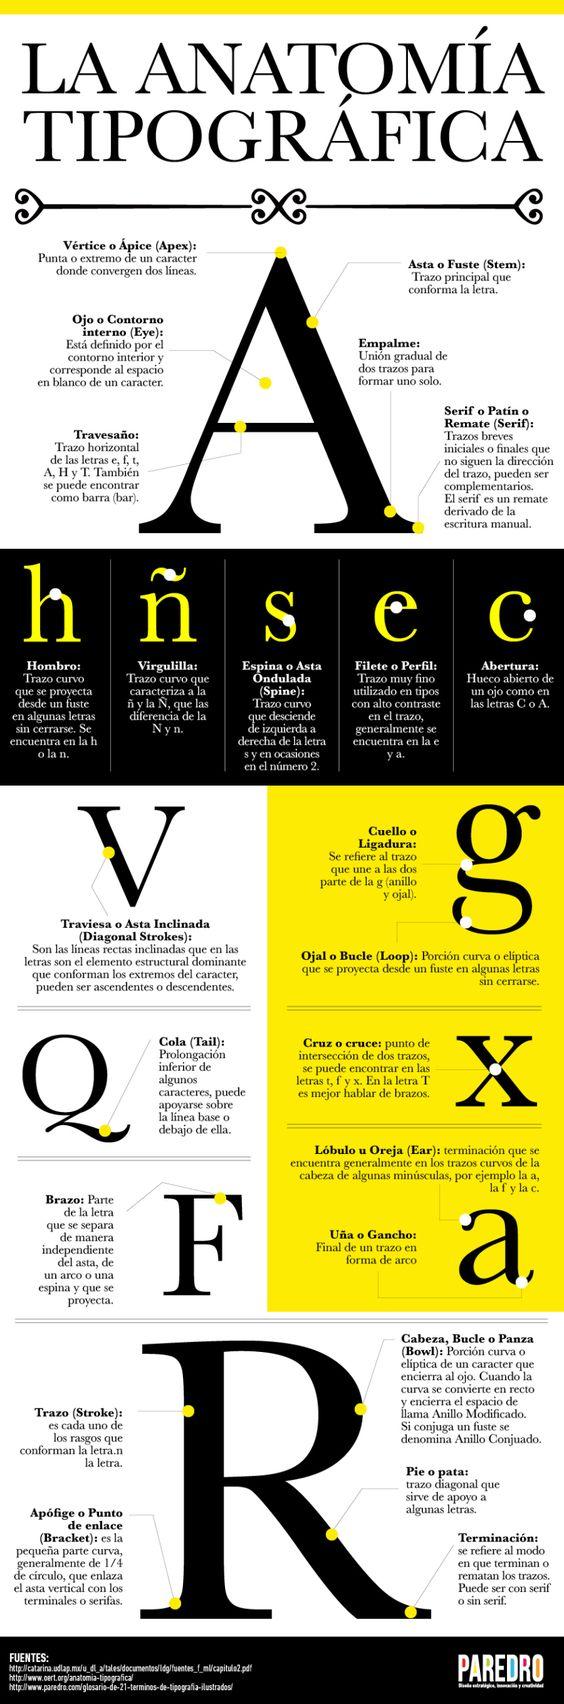 La anatomía tipográfica #infografia #infographic #design